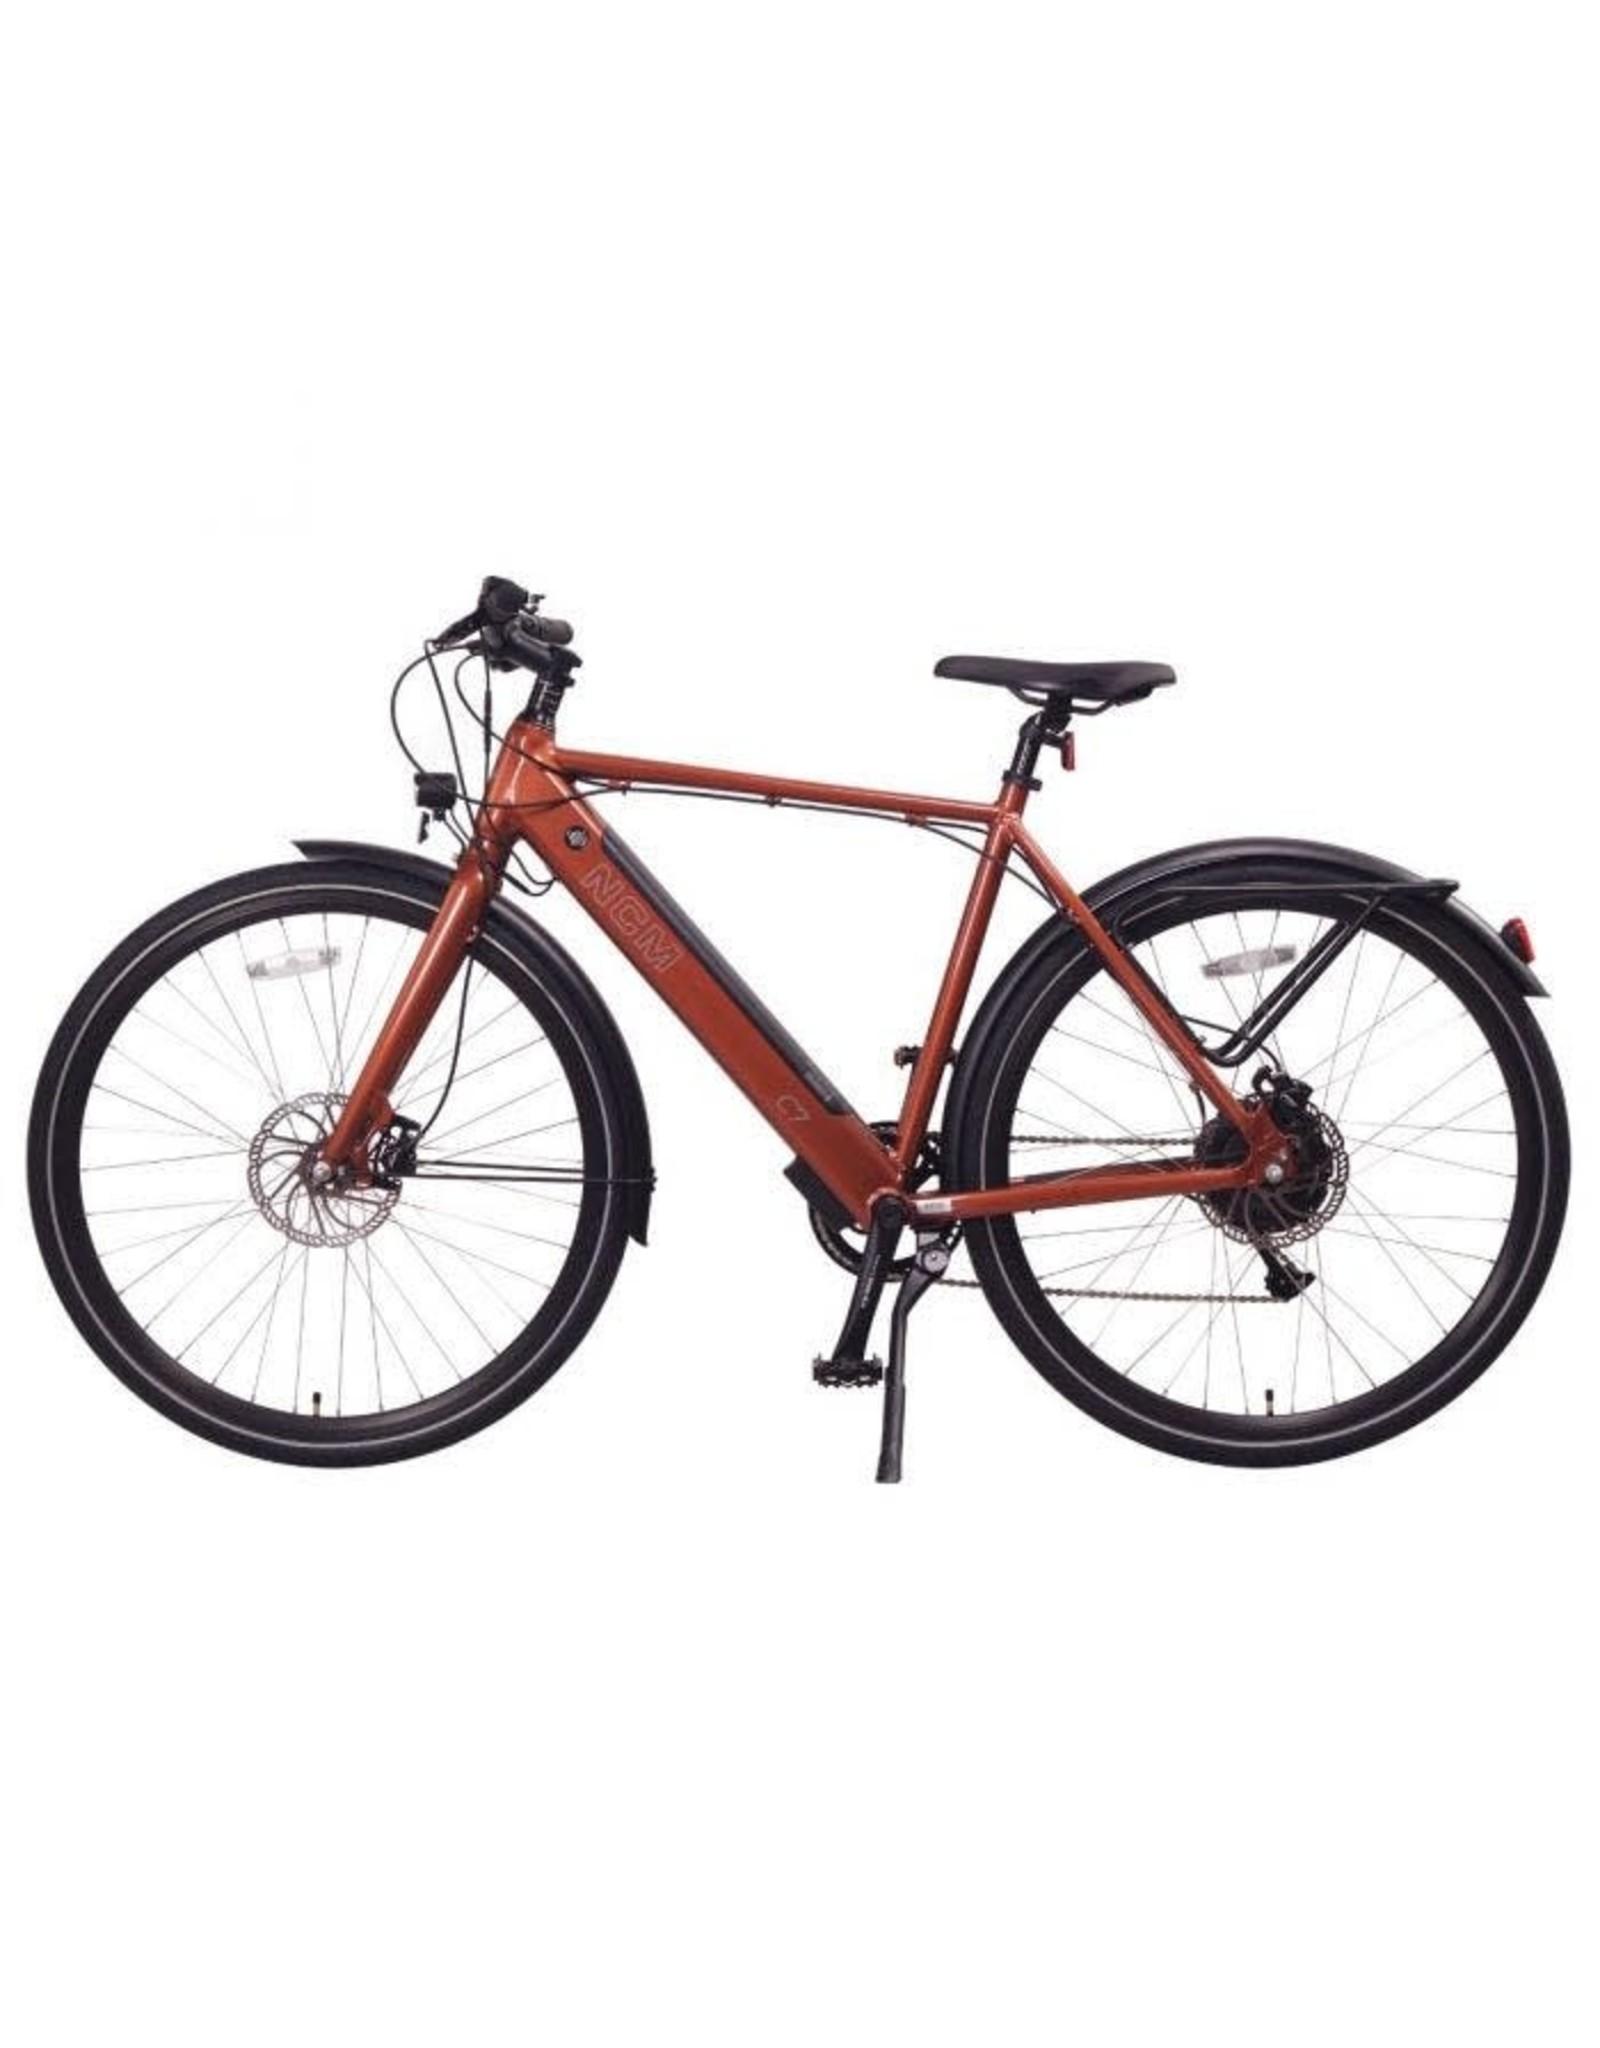 LEON CYCLE Leon Cycle NCM C7 brick red electric hybrid bike